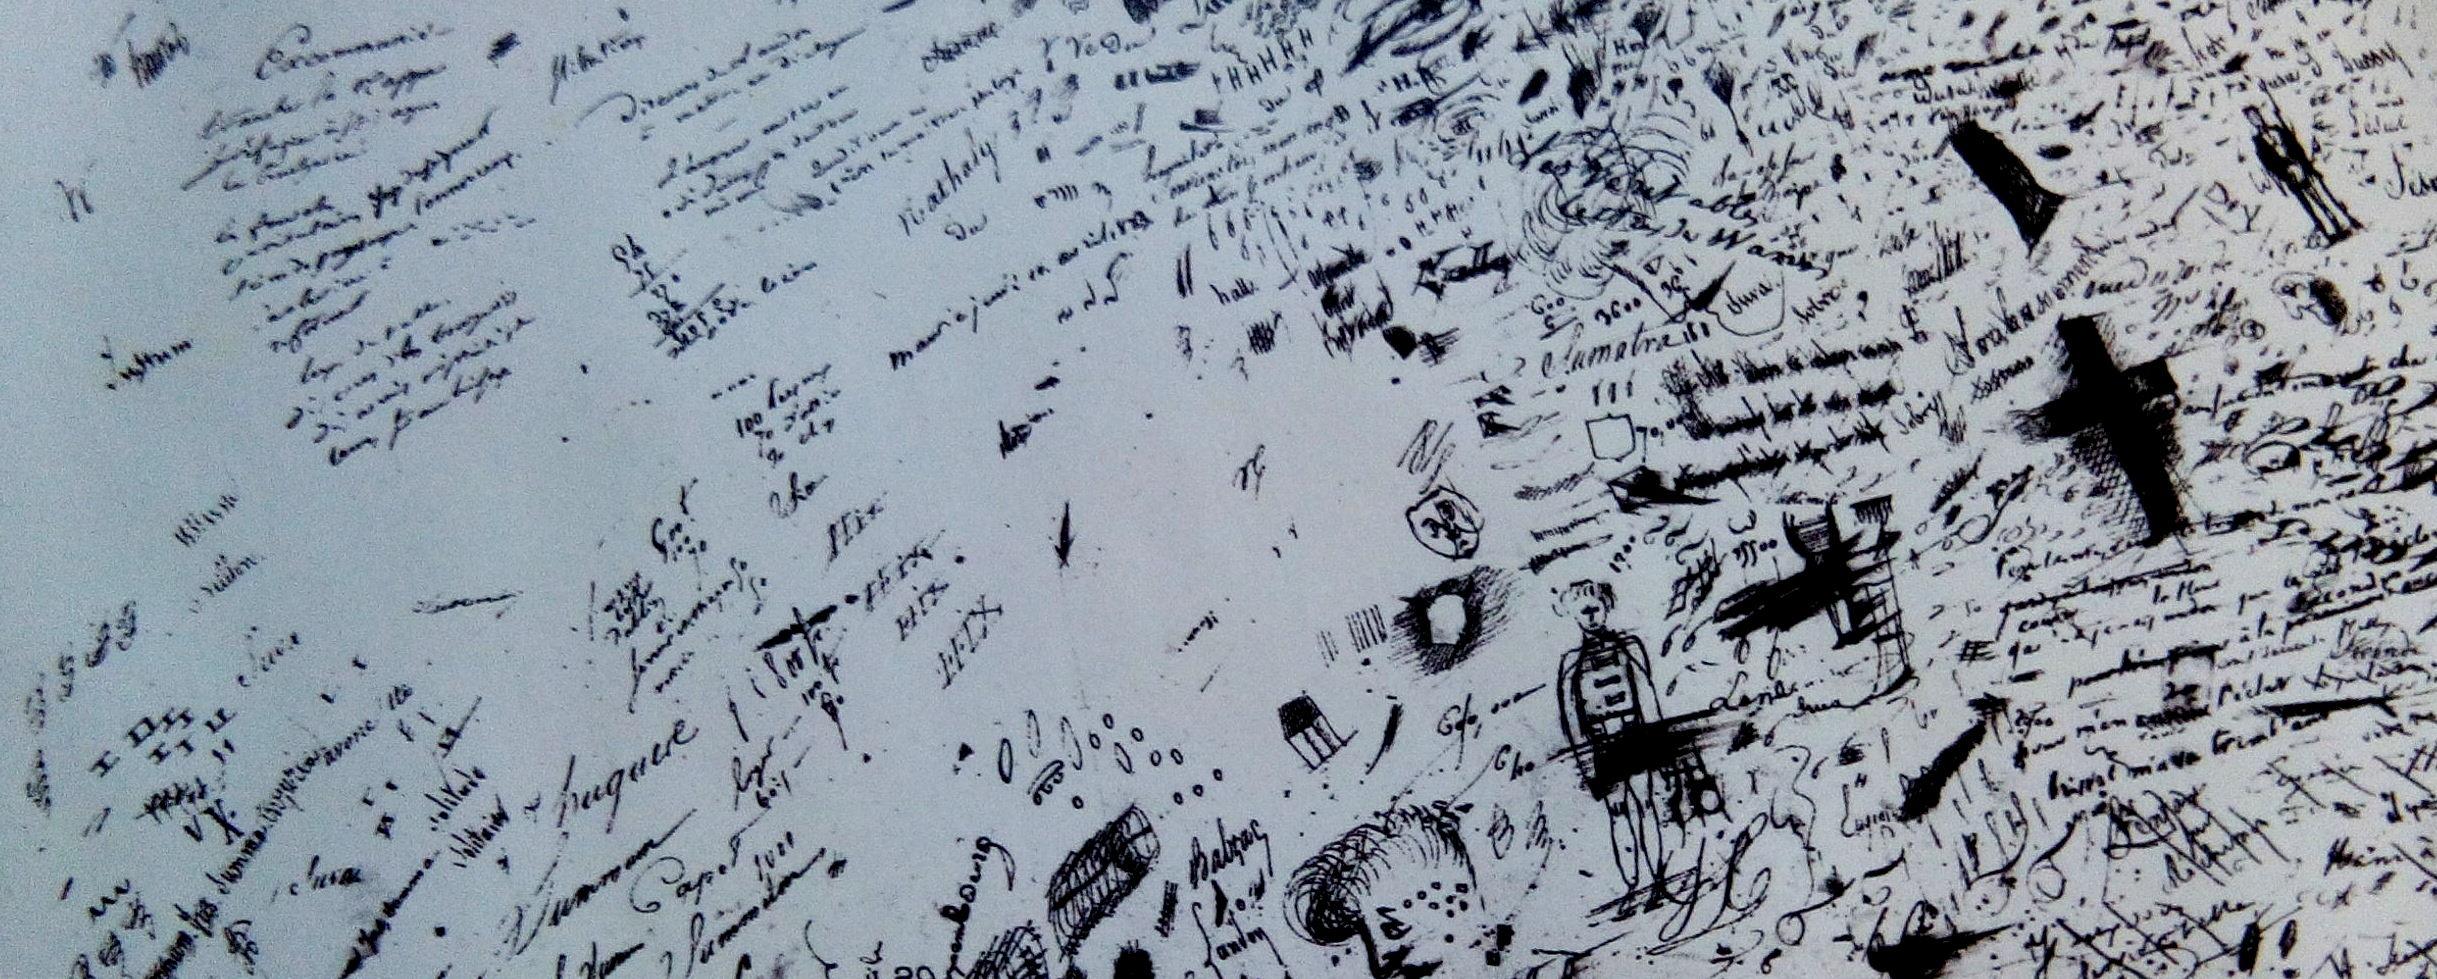 Manuscrit de Balzac